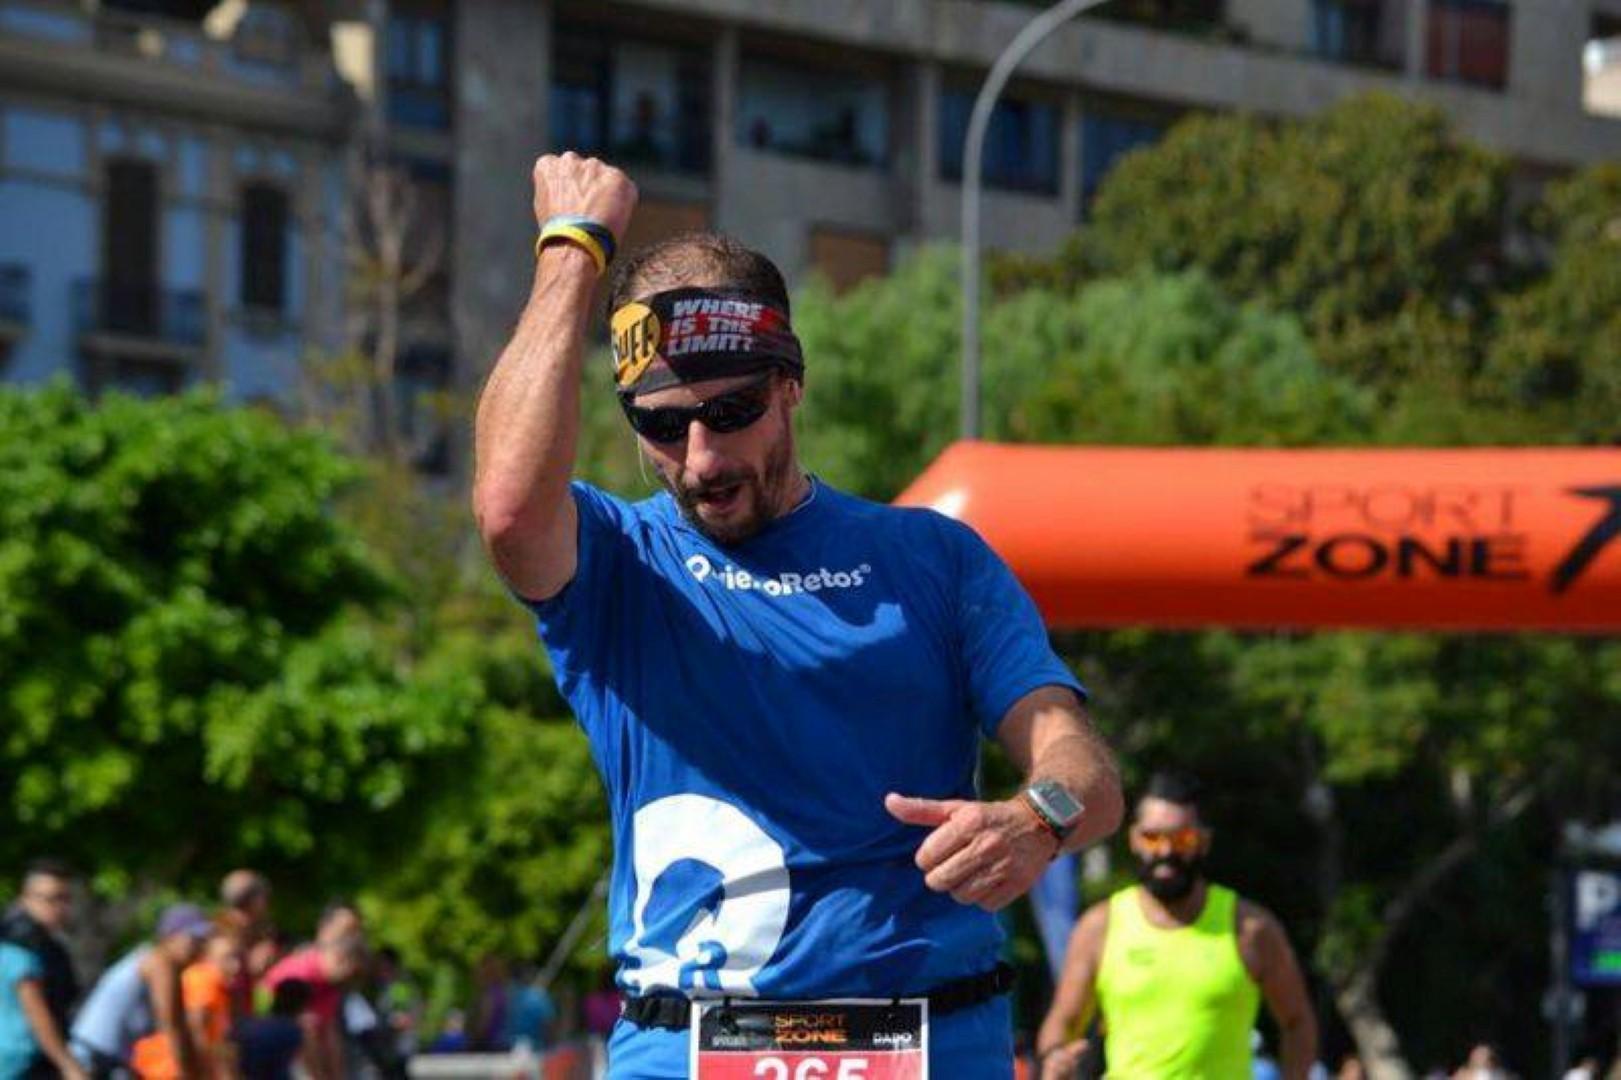 Corredor maratón Tenerife